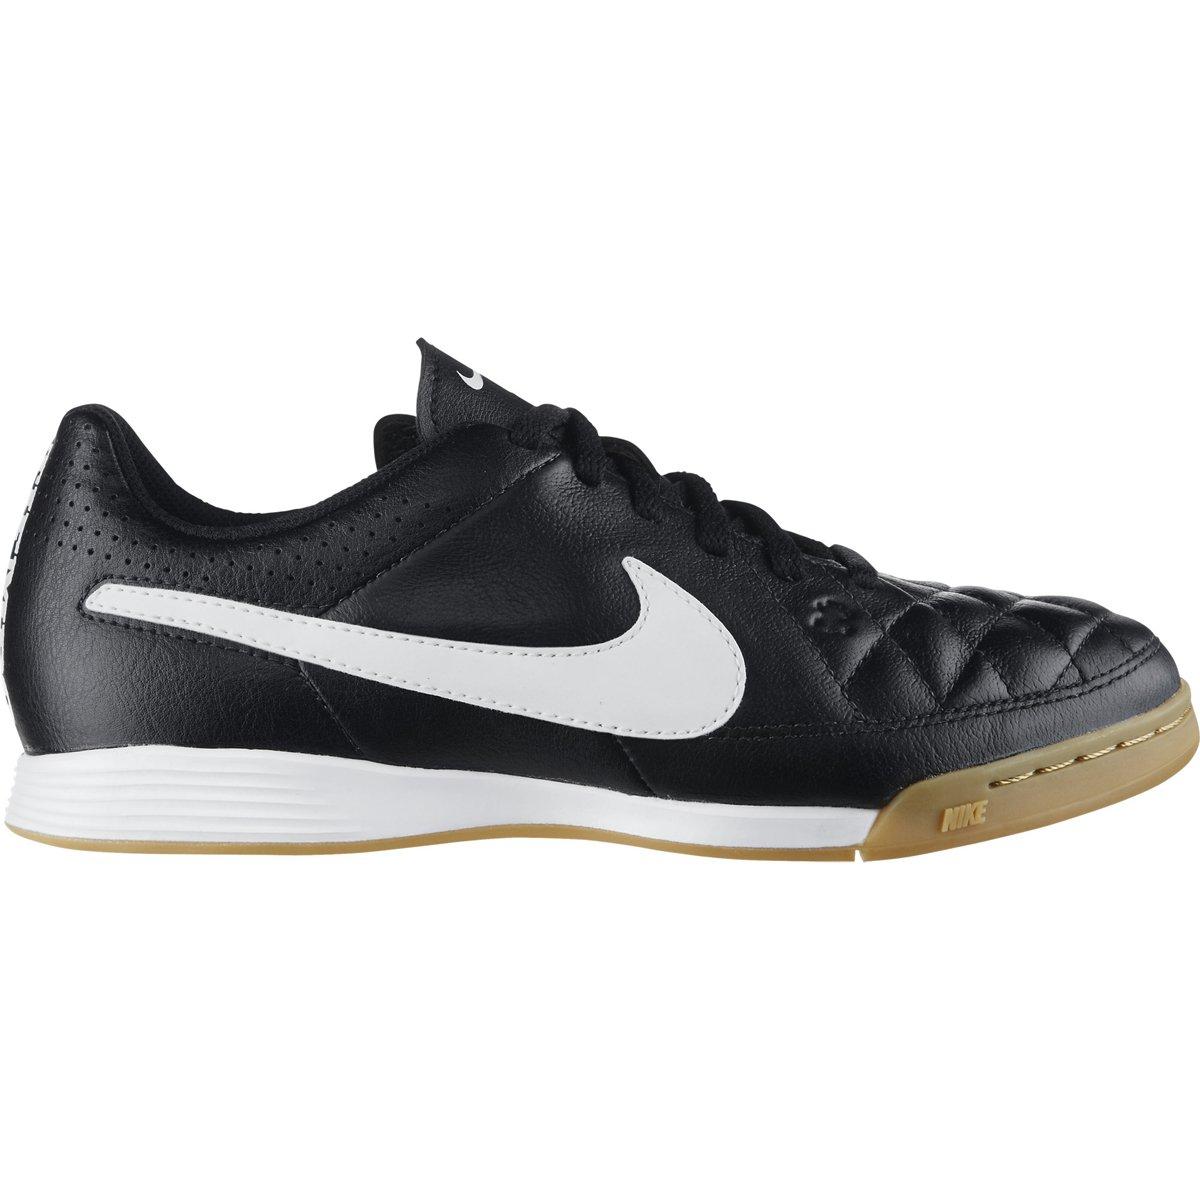 Chuteira Nike Tiempo Gênio Leather IC Futsal Infantil - Compre Agora ... 79bd2e517e8fb